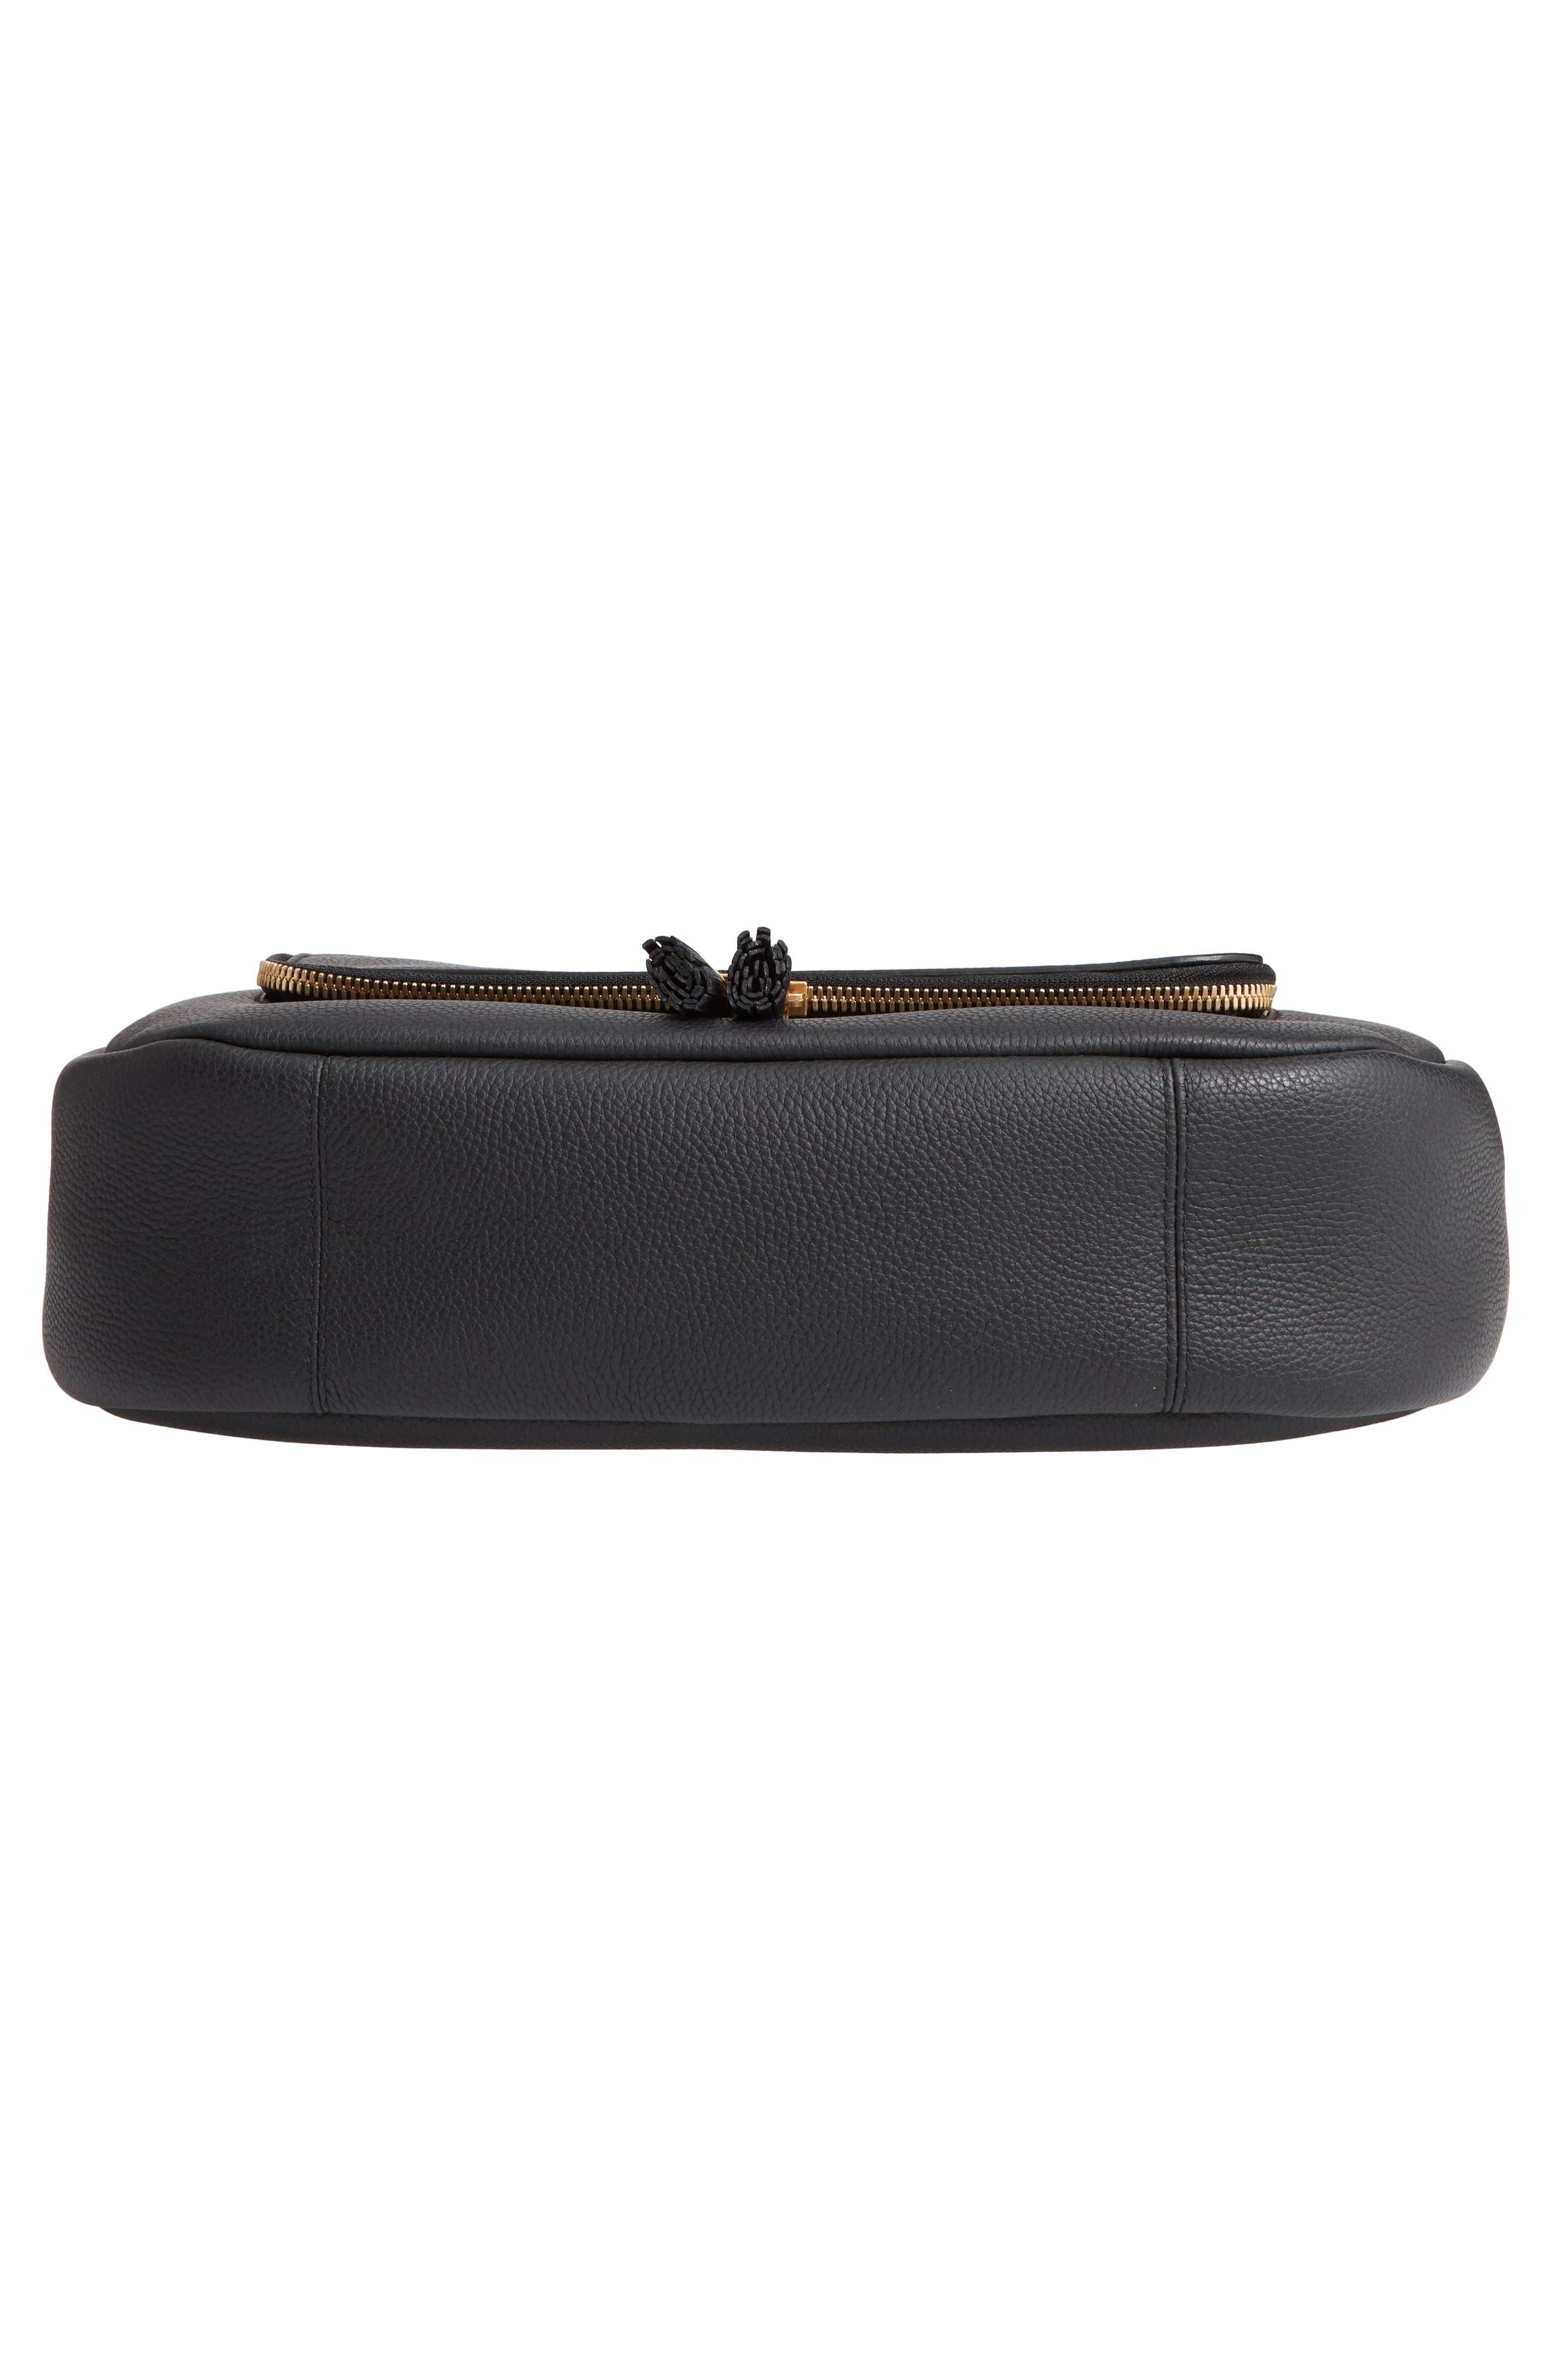 Maxi Vere Soft Satchel Shoulder Bag,                             Alternate thumbnail 7, color,                             BLACK